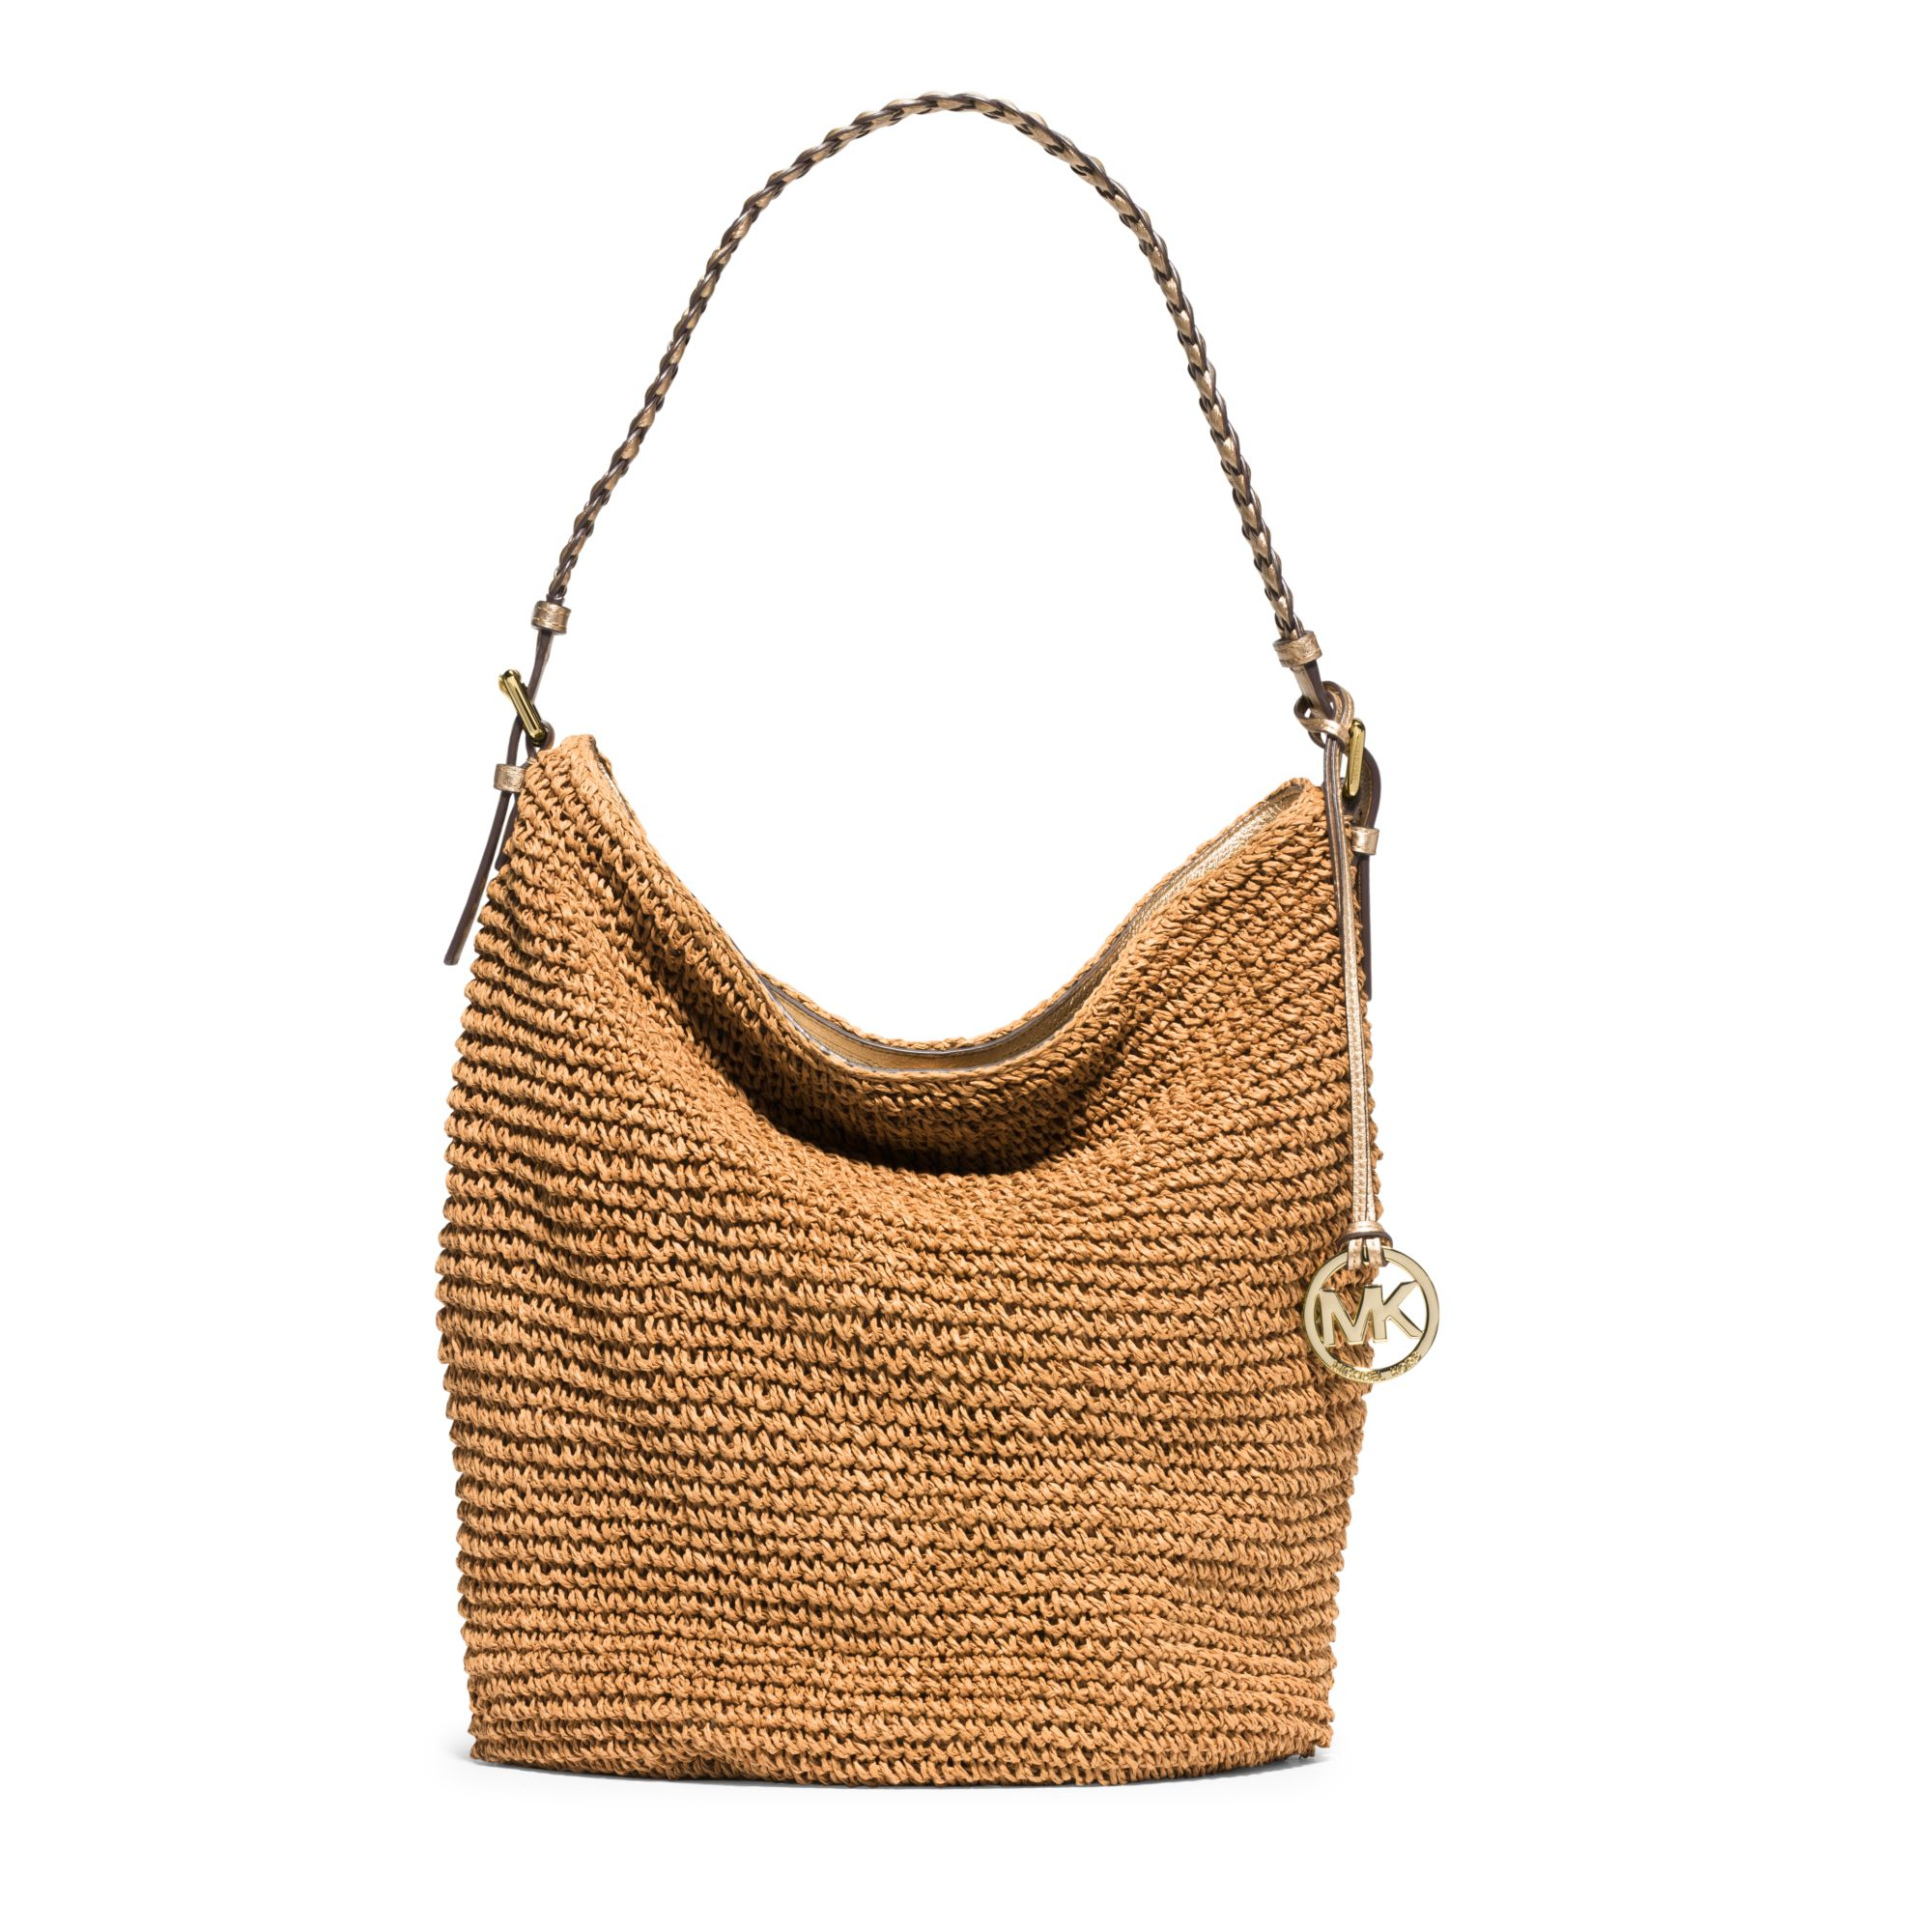 c12ec0b1ab71 ... cheapest lyst michael kors lola large raffia shoulder bag in brown  5f3cb 4e4bc ...